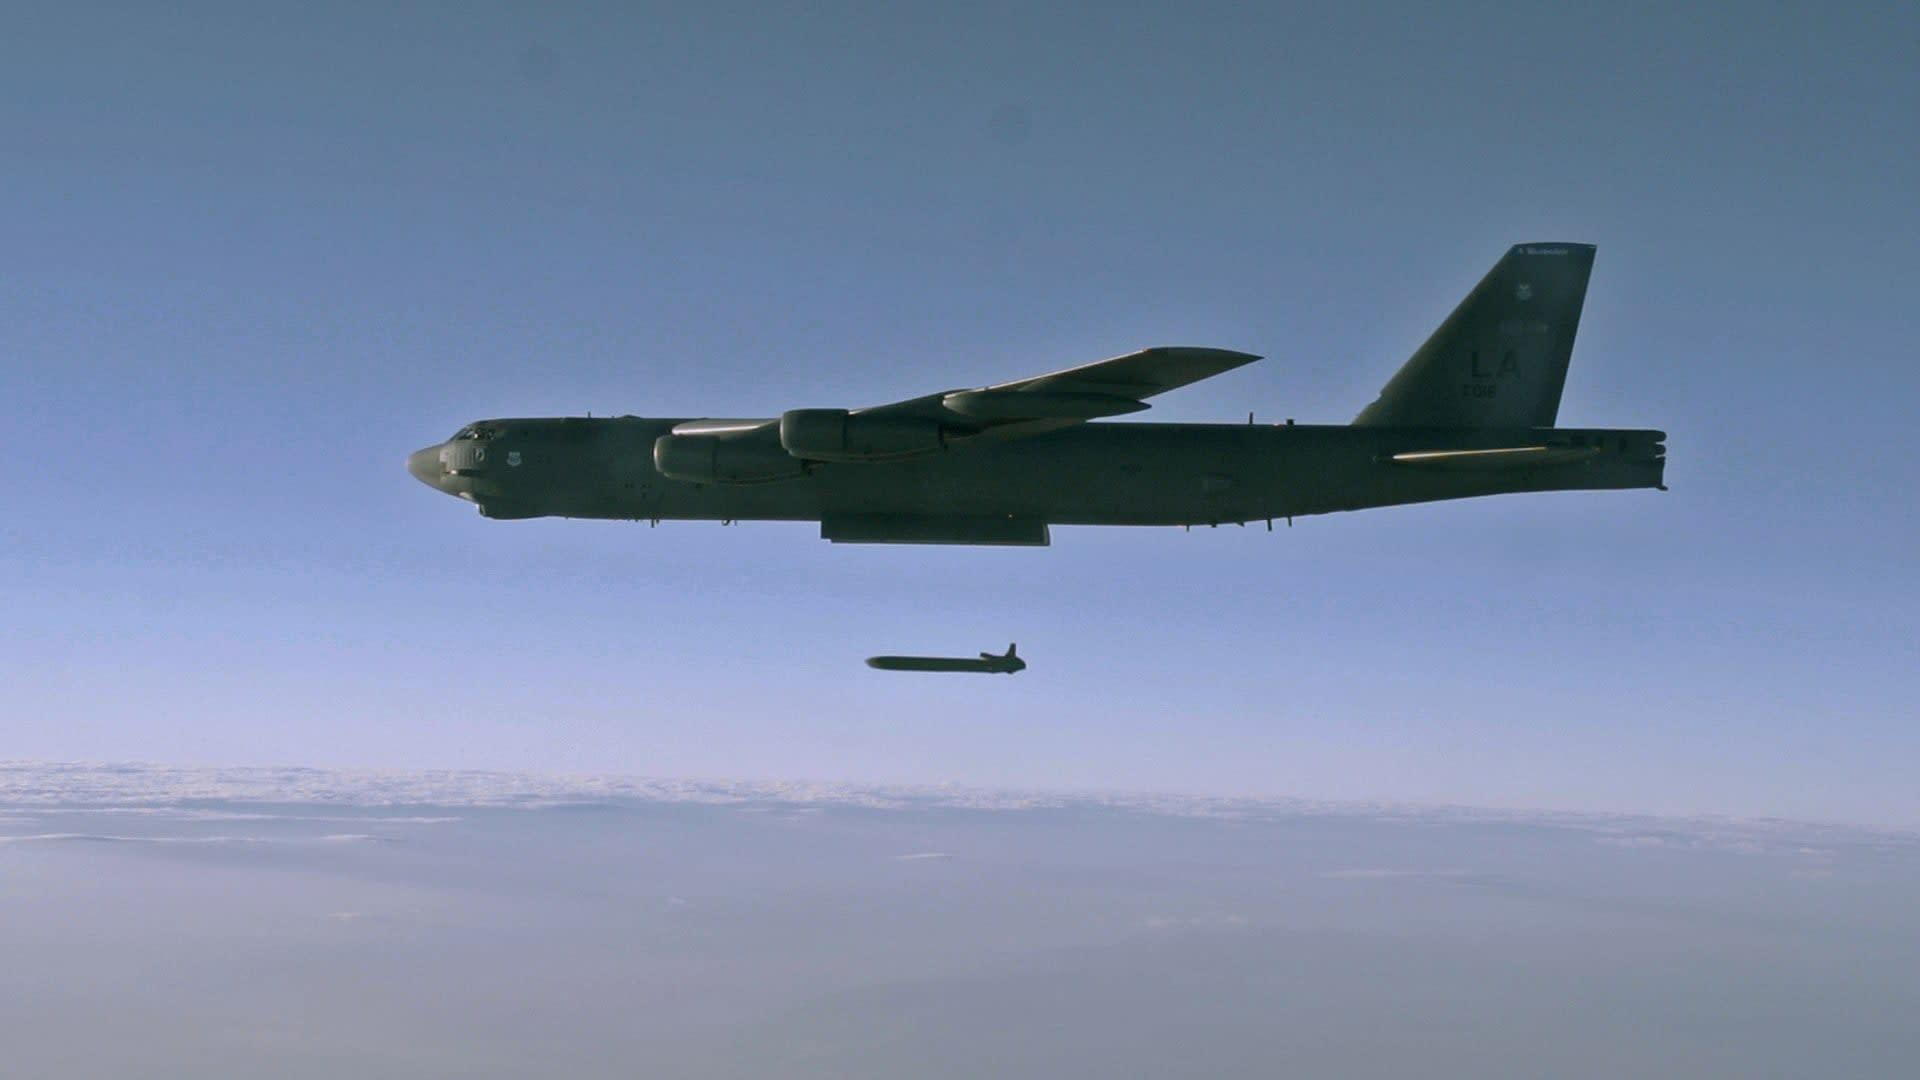 US AIR FORCE / Reuters